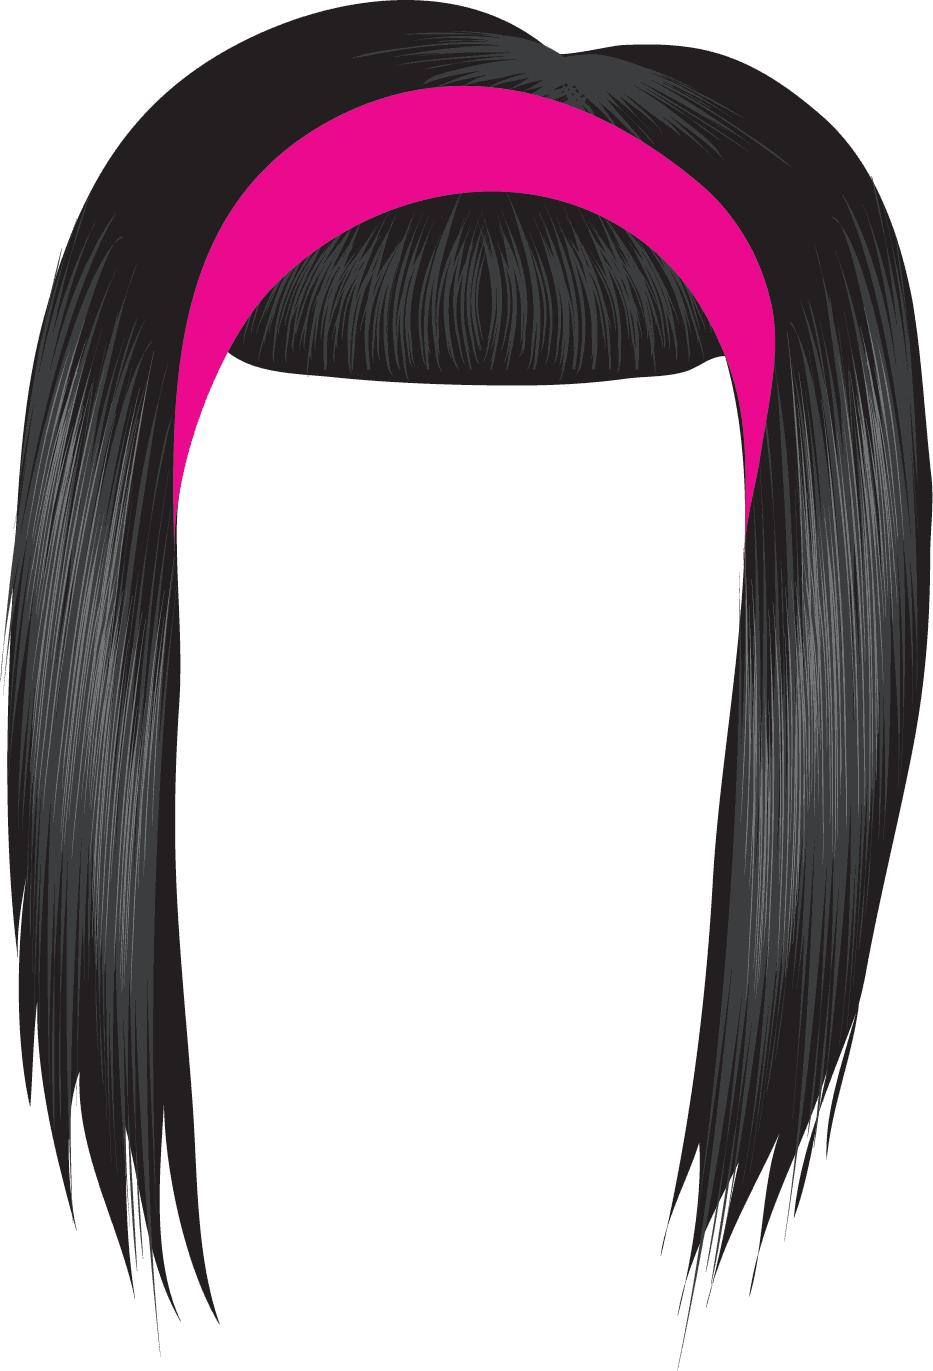 Black Hair Wig Clipart Black Clipart Panda Free Clipart Images